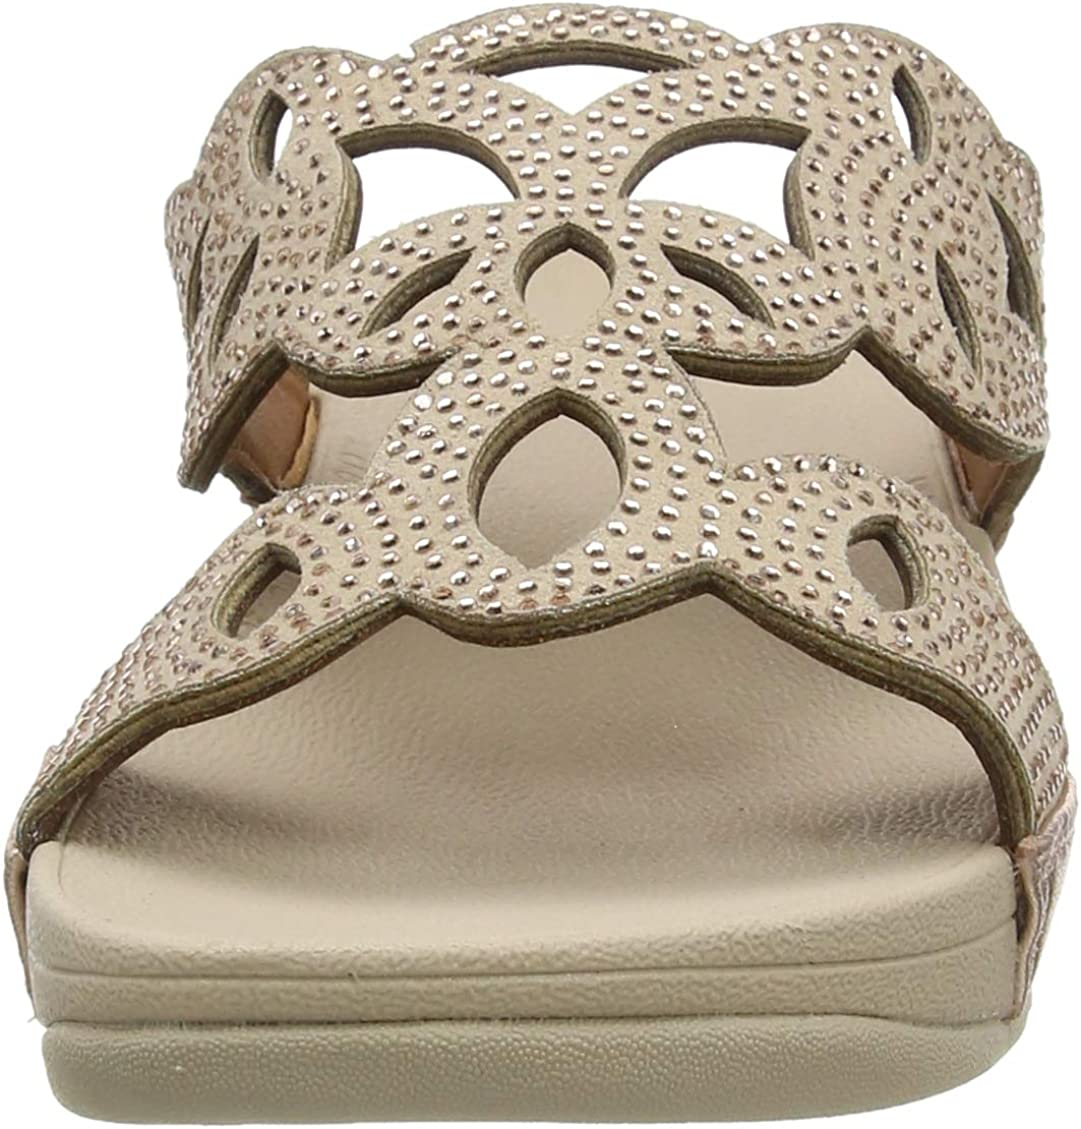 Fitflop Women's Elora Crystal Slides Open Toe Sandals Pink Rose Gold 323